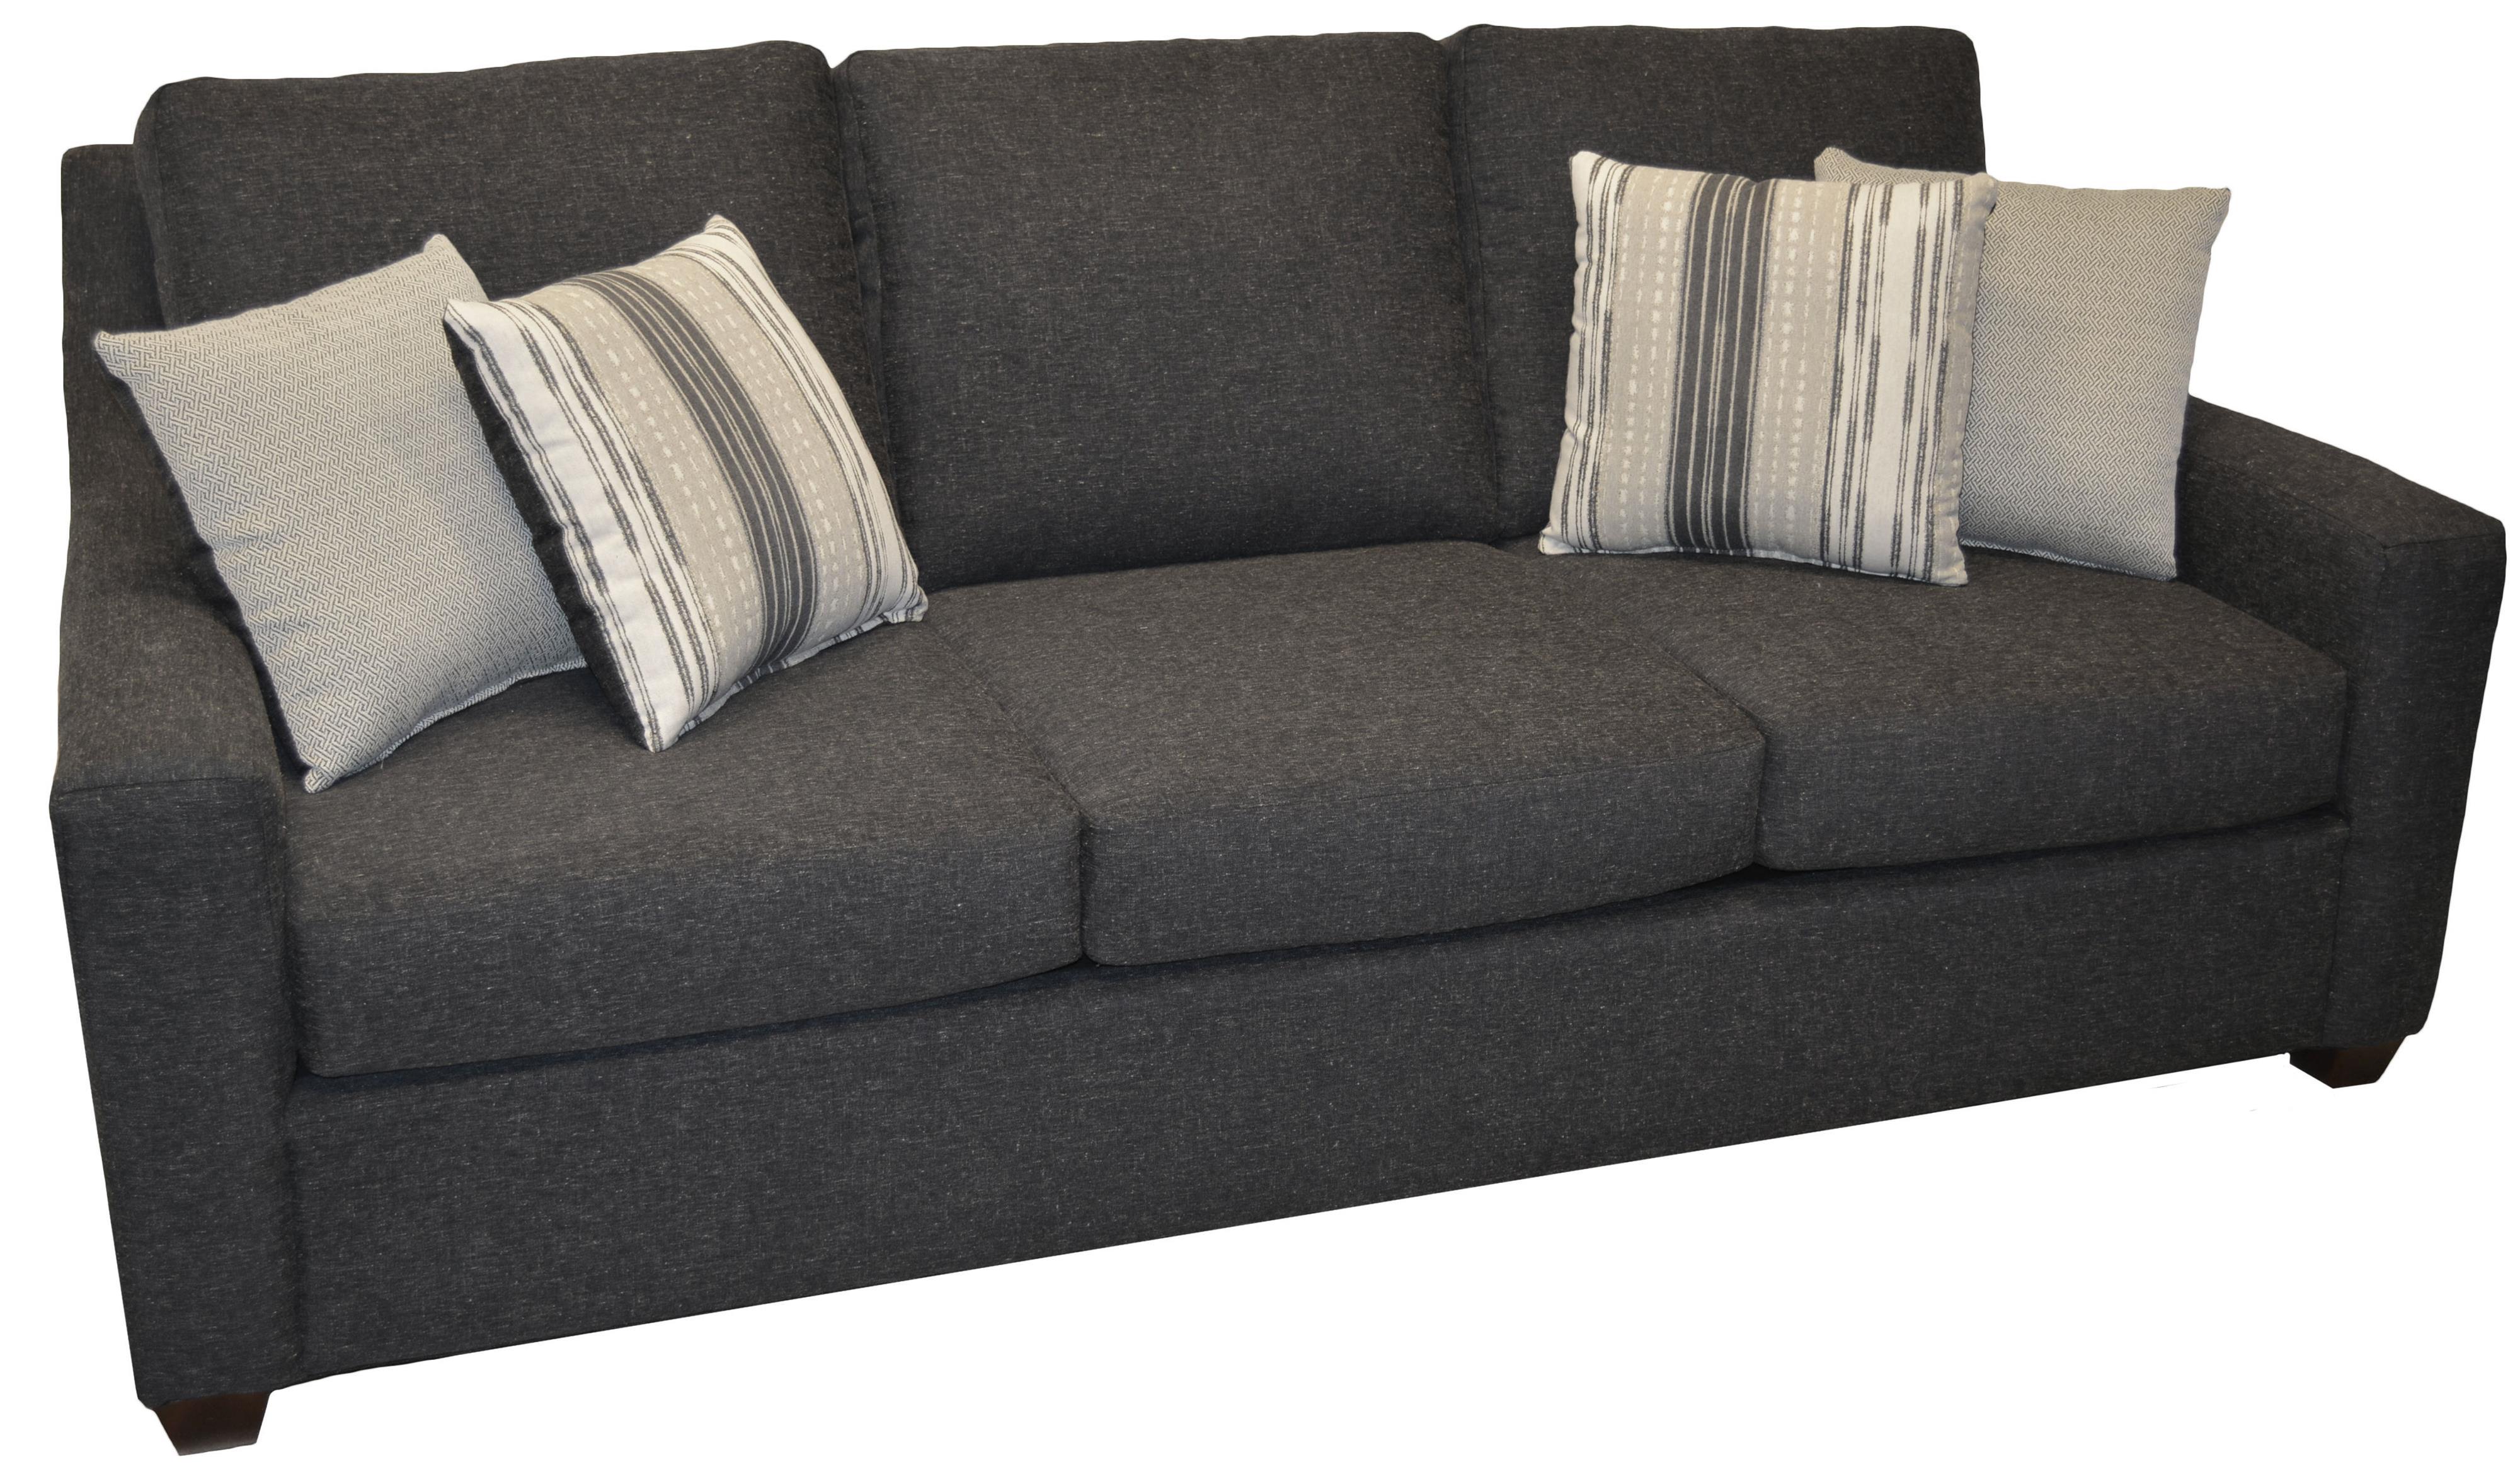 423 Queen Sleeper Sofa by LaCrosse at Mueller Furniture